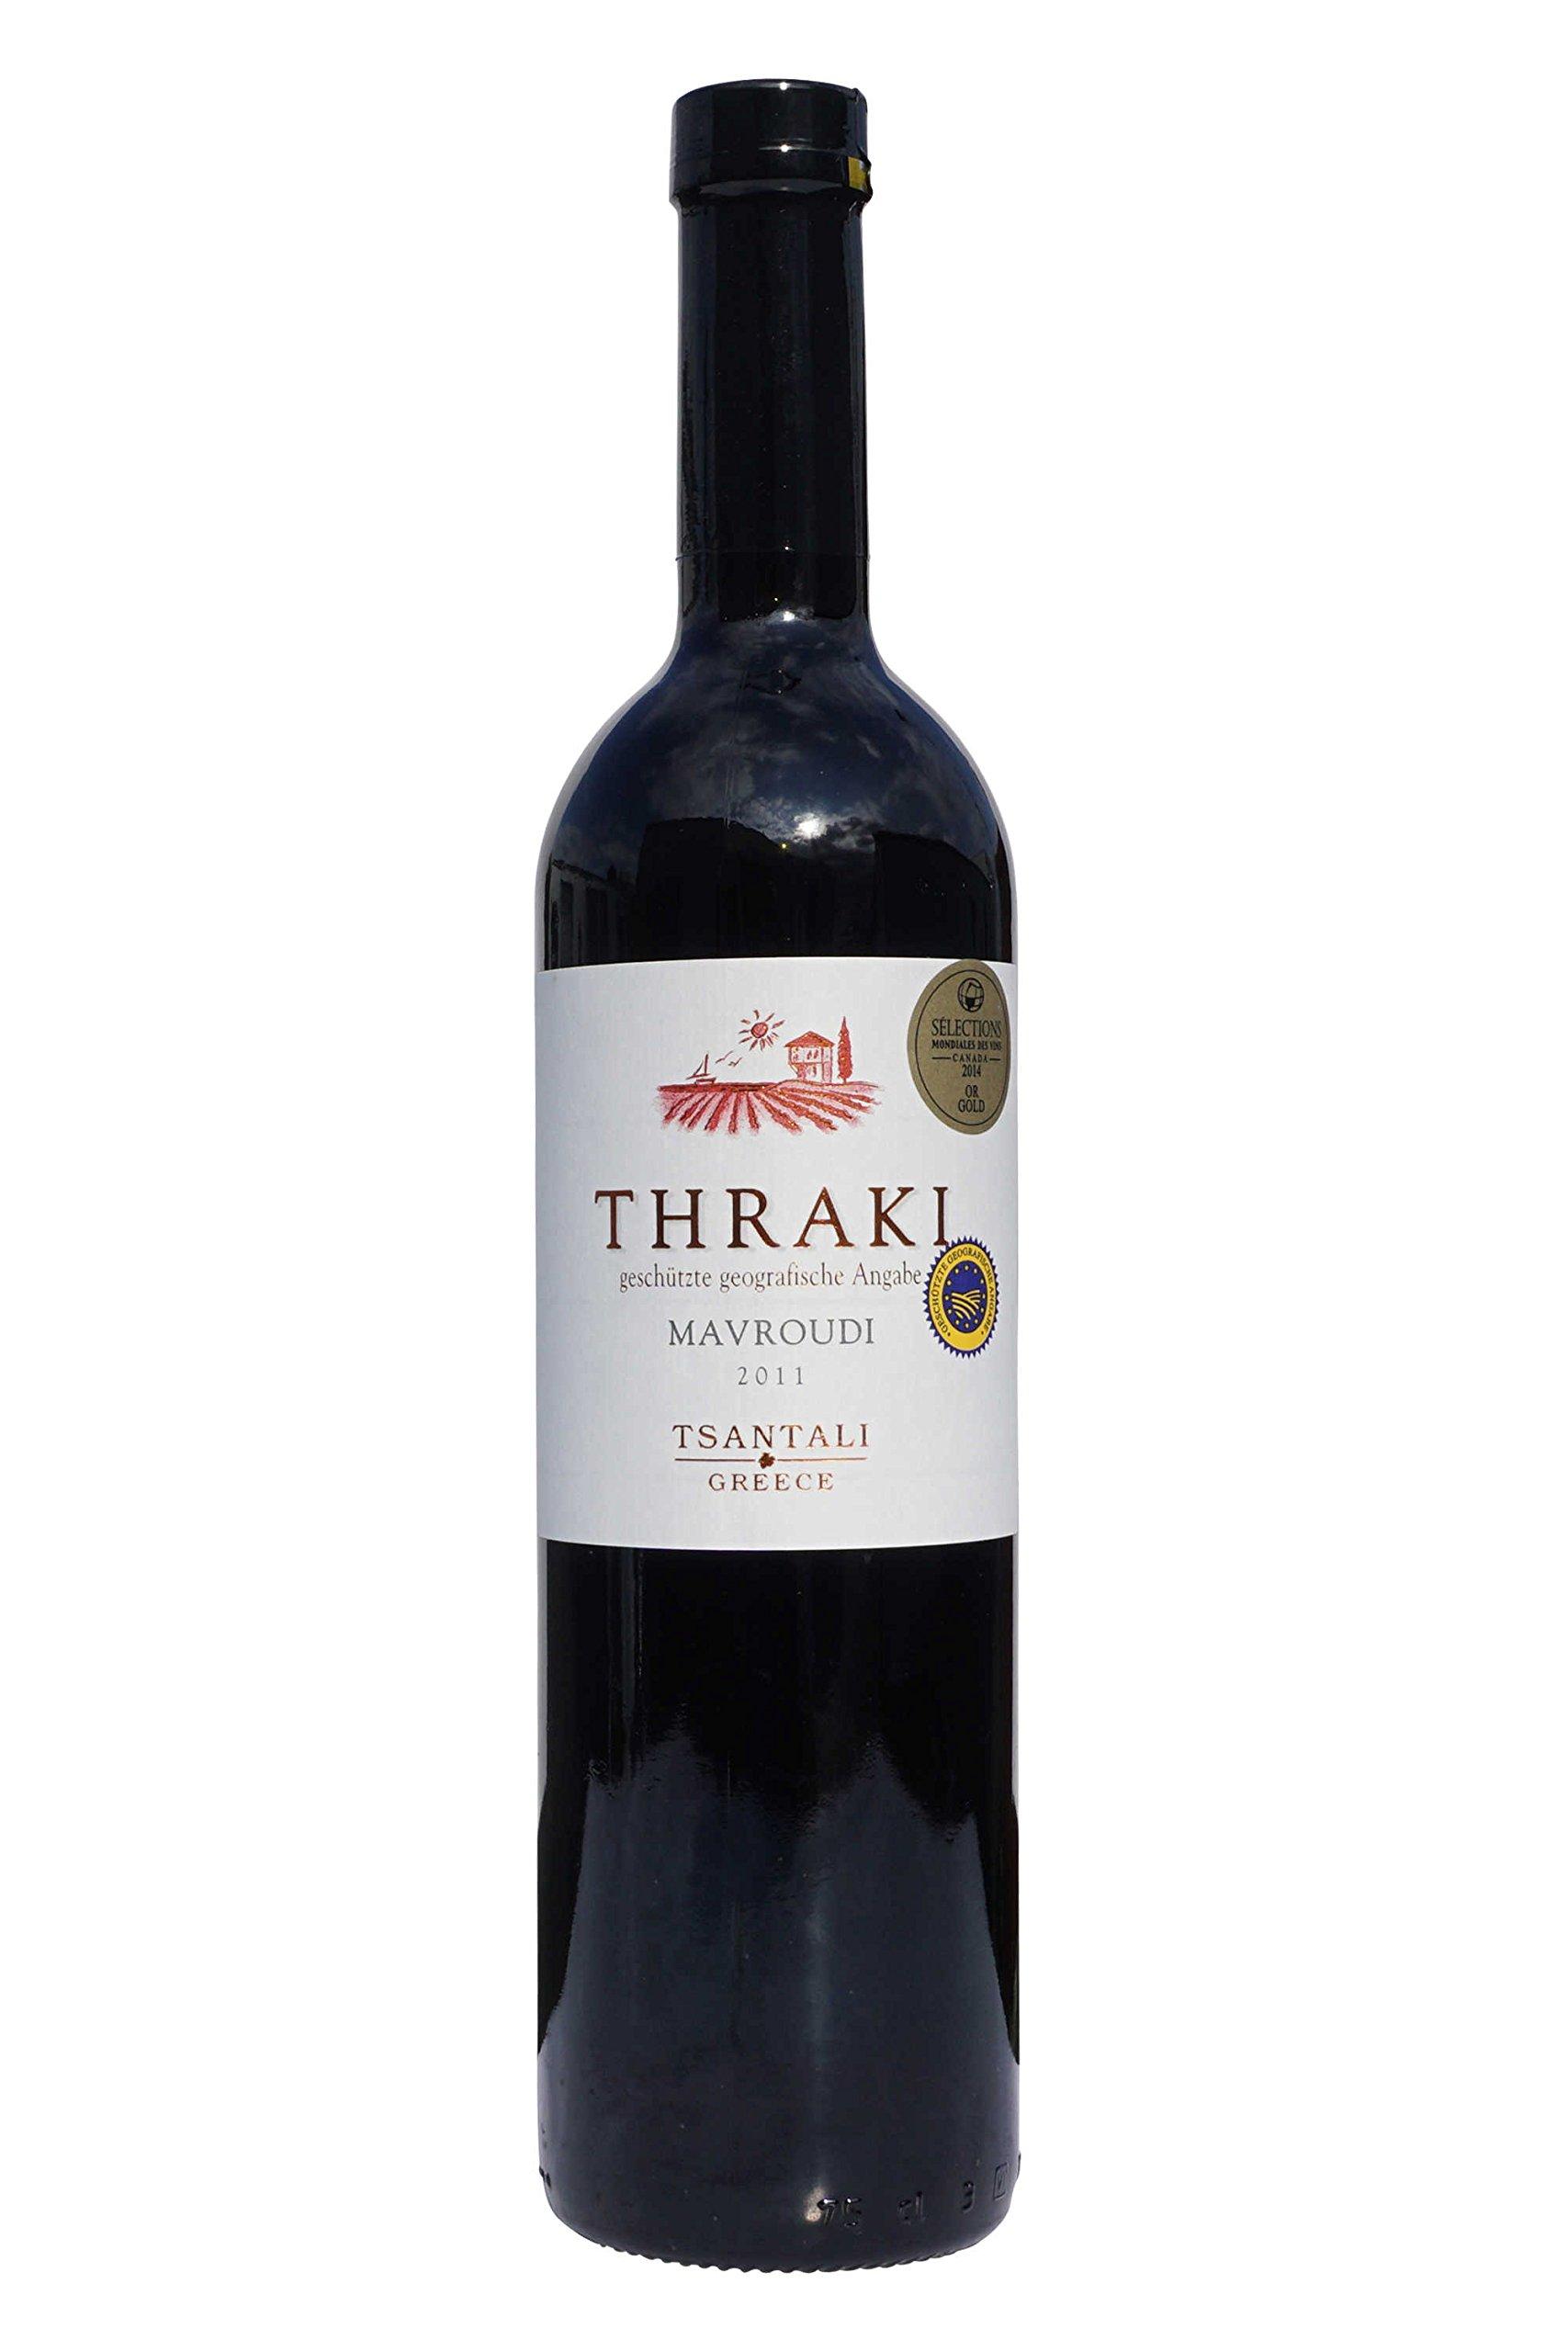 Thraki-Mavroudi-Rotwein-trocken-750ml135-Tsantali-griechischer-roter-Wein-aus-Chalkidiki-6-Monate-gereift